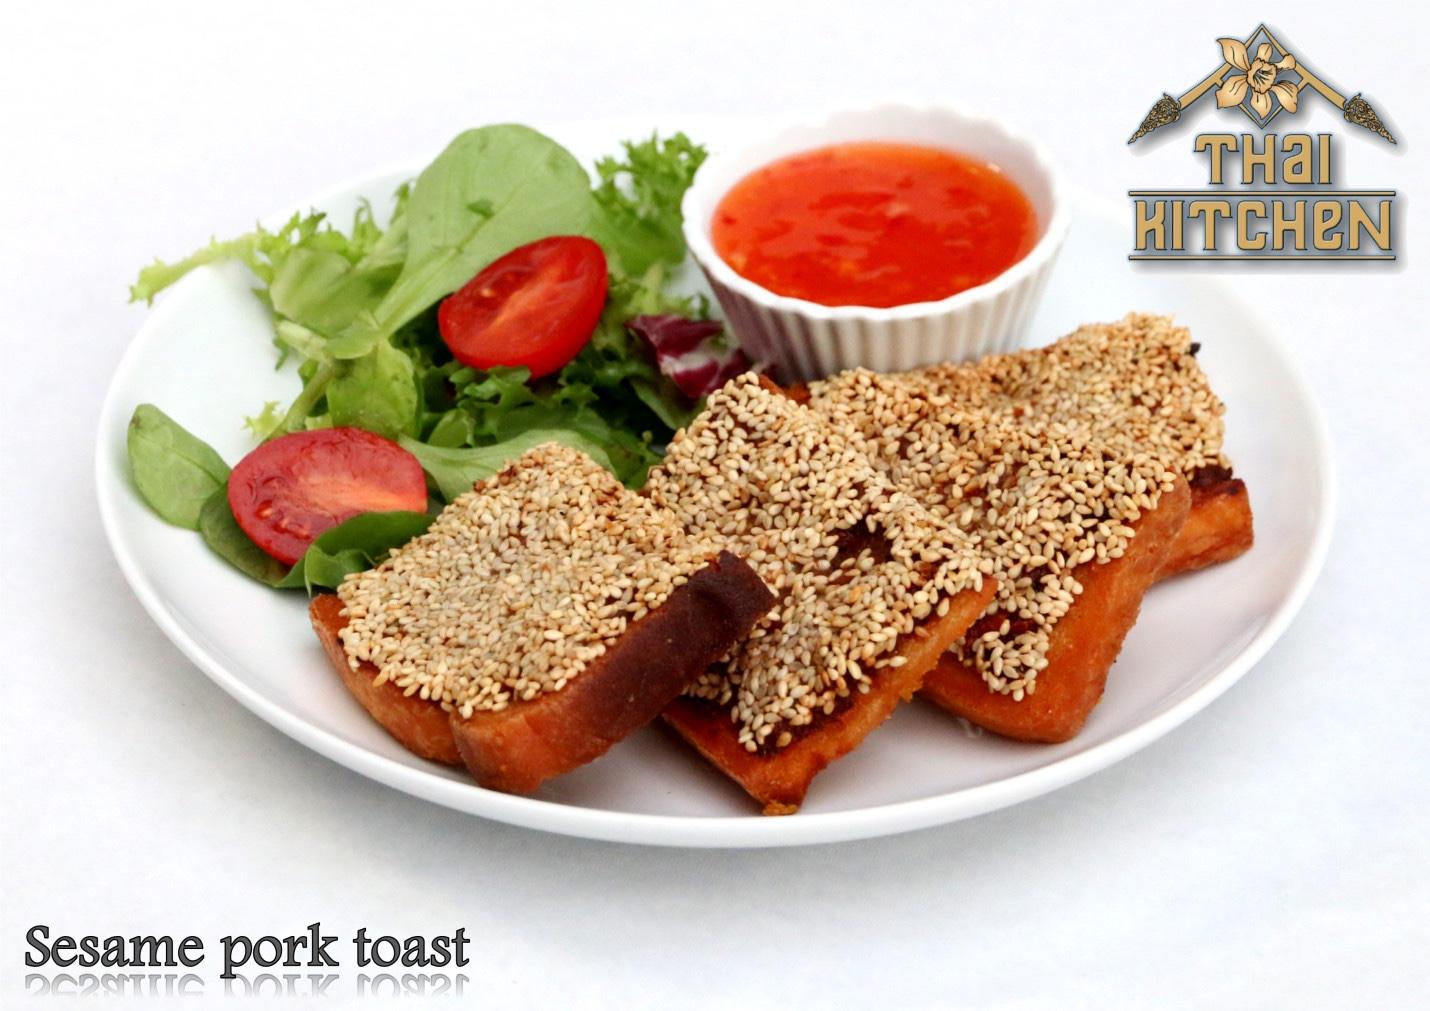 sesame pork toast recipe